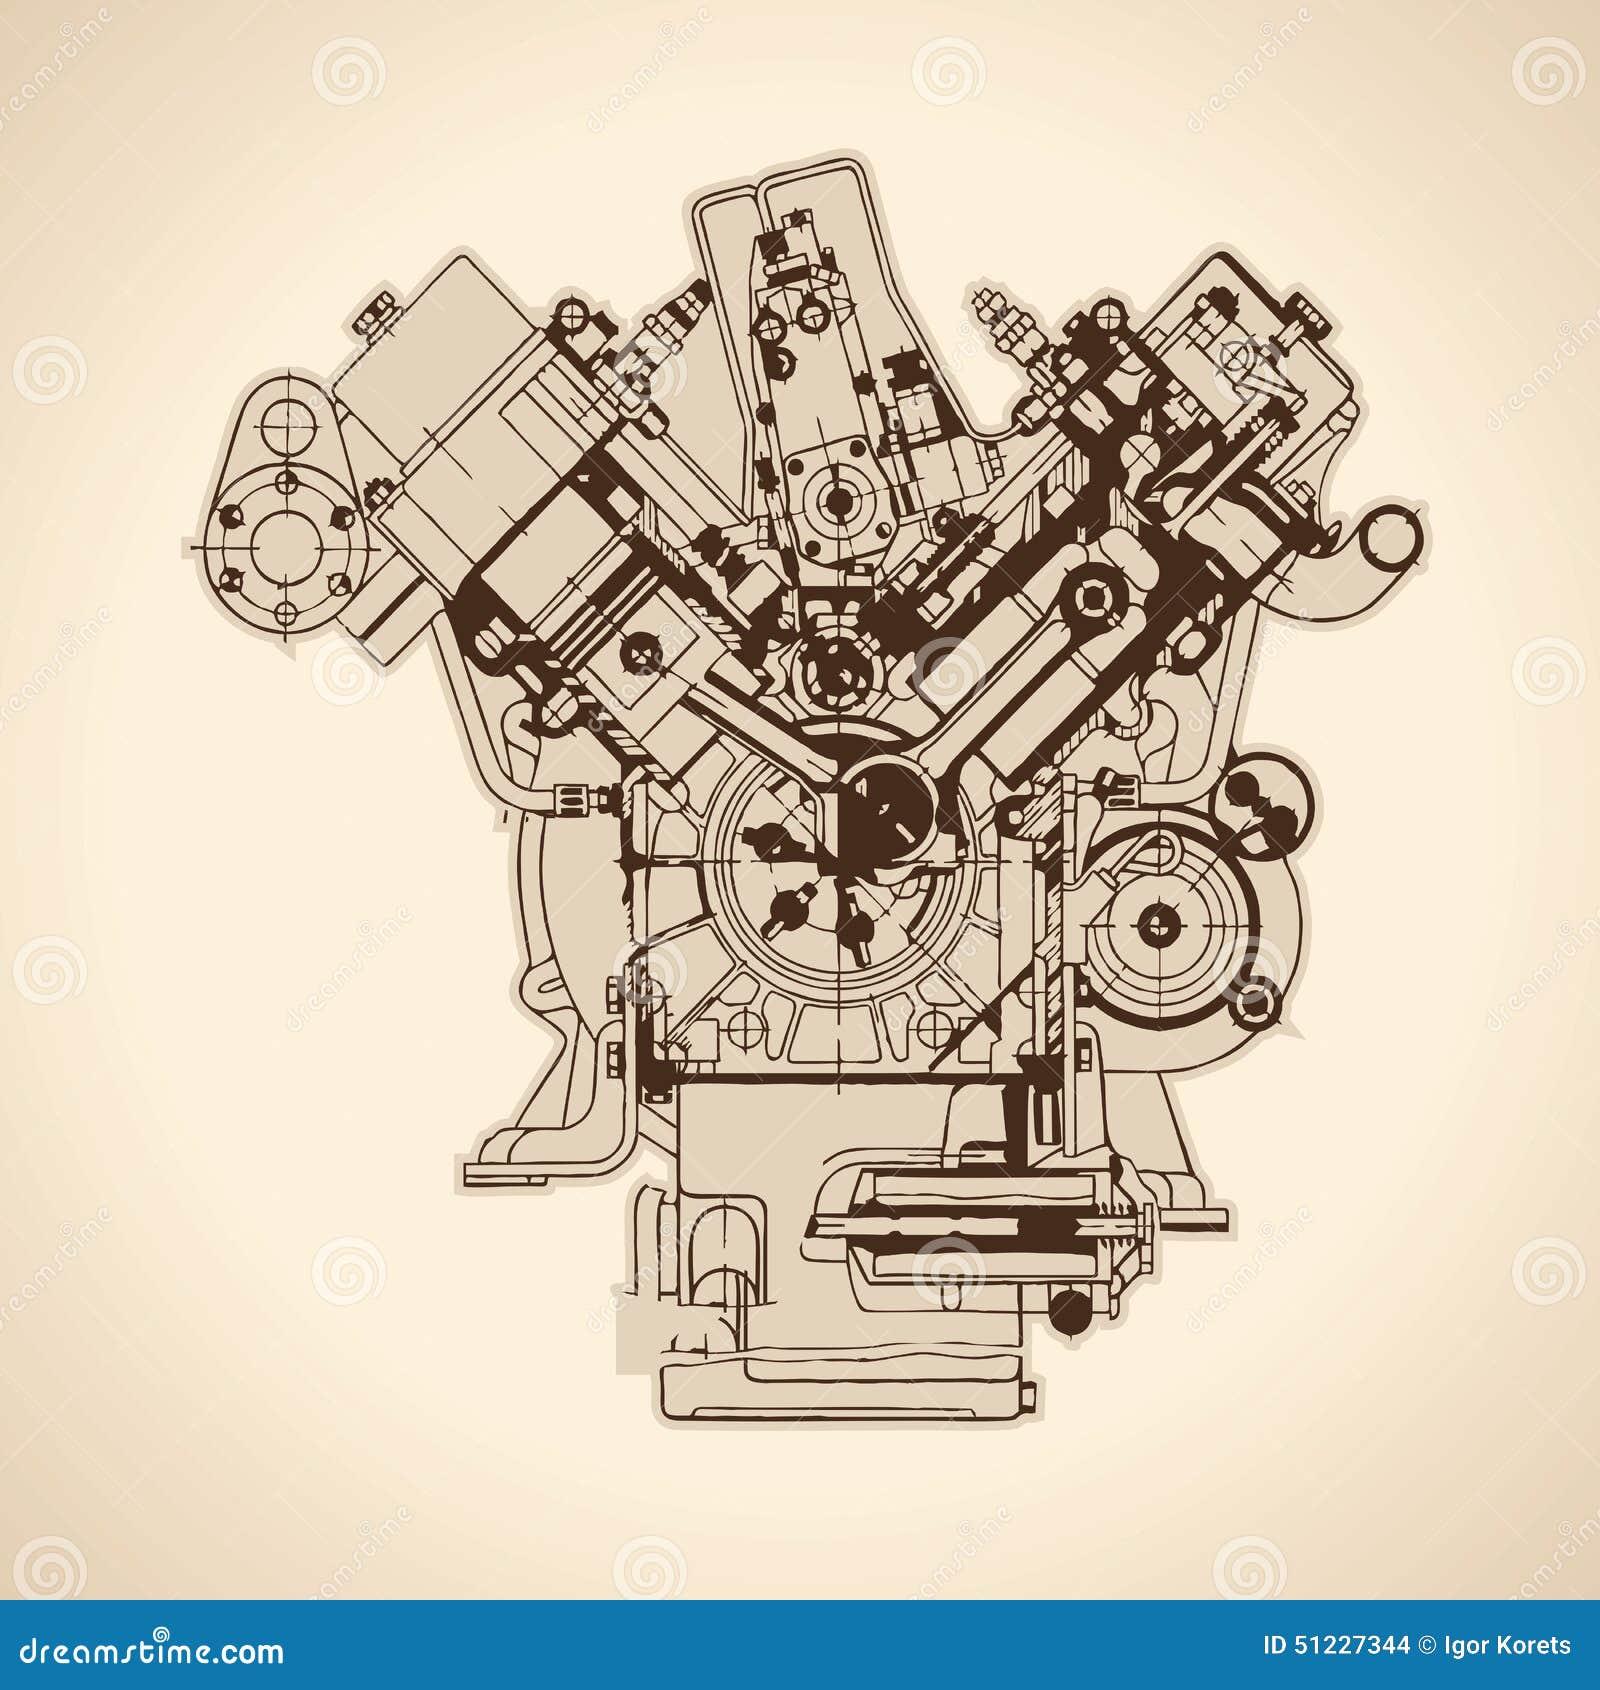 Vintage Engine Diagram - House Wiring Diagram Symbols •